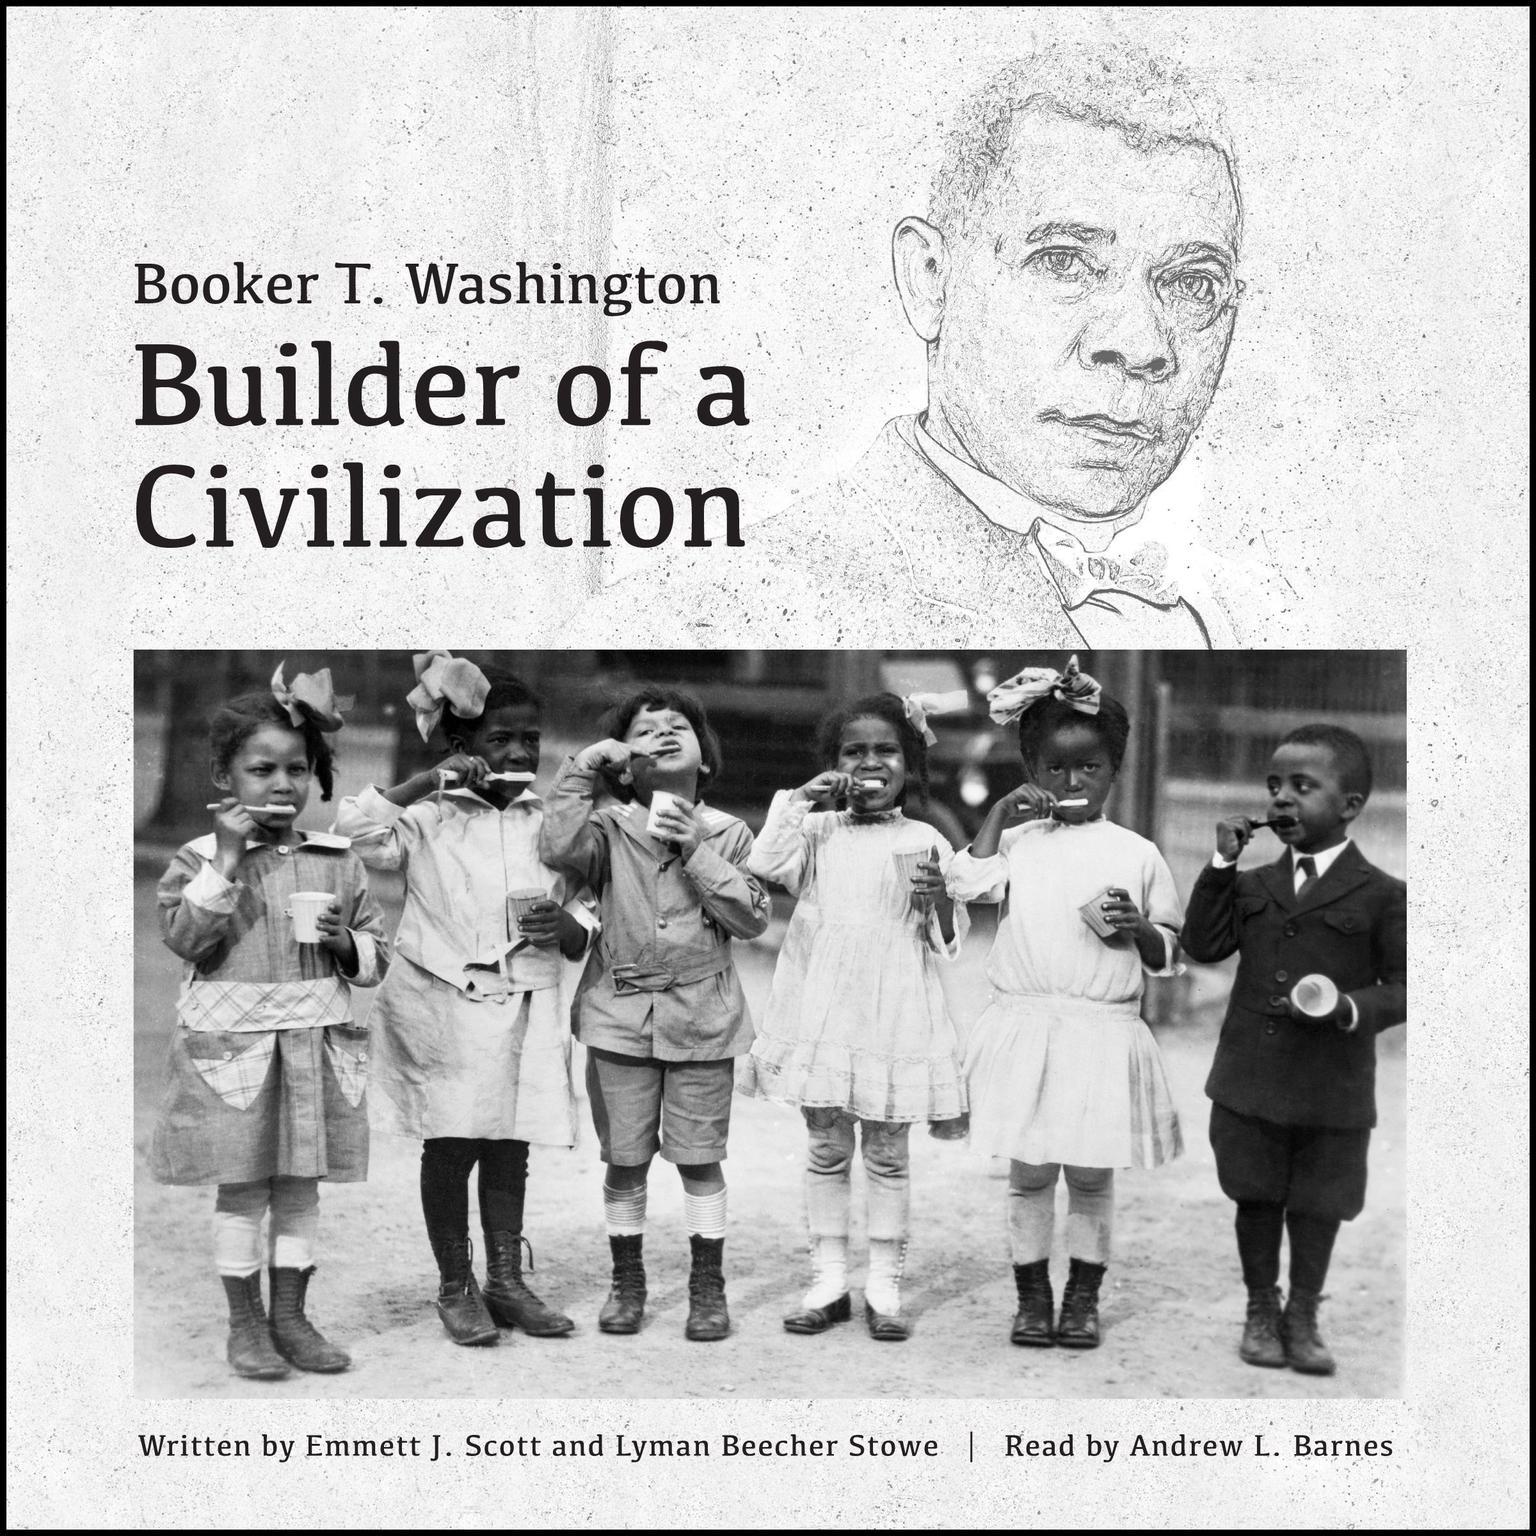 Booker T. Washington: Builder of a Civilization Audiobook, by Emmett J. Scott